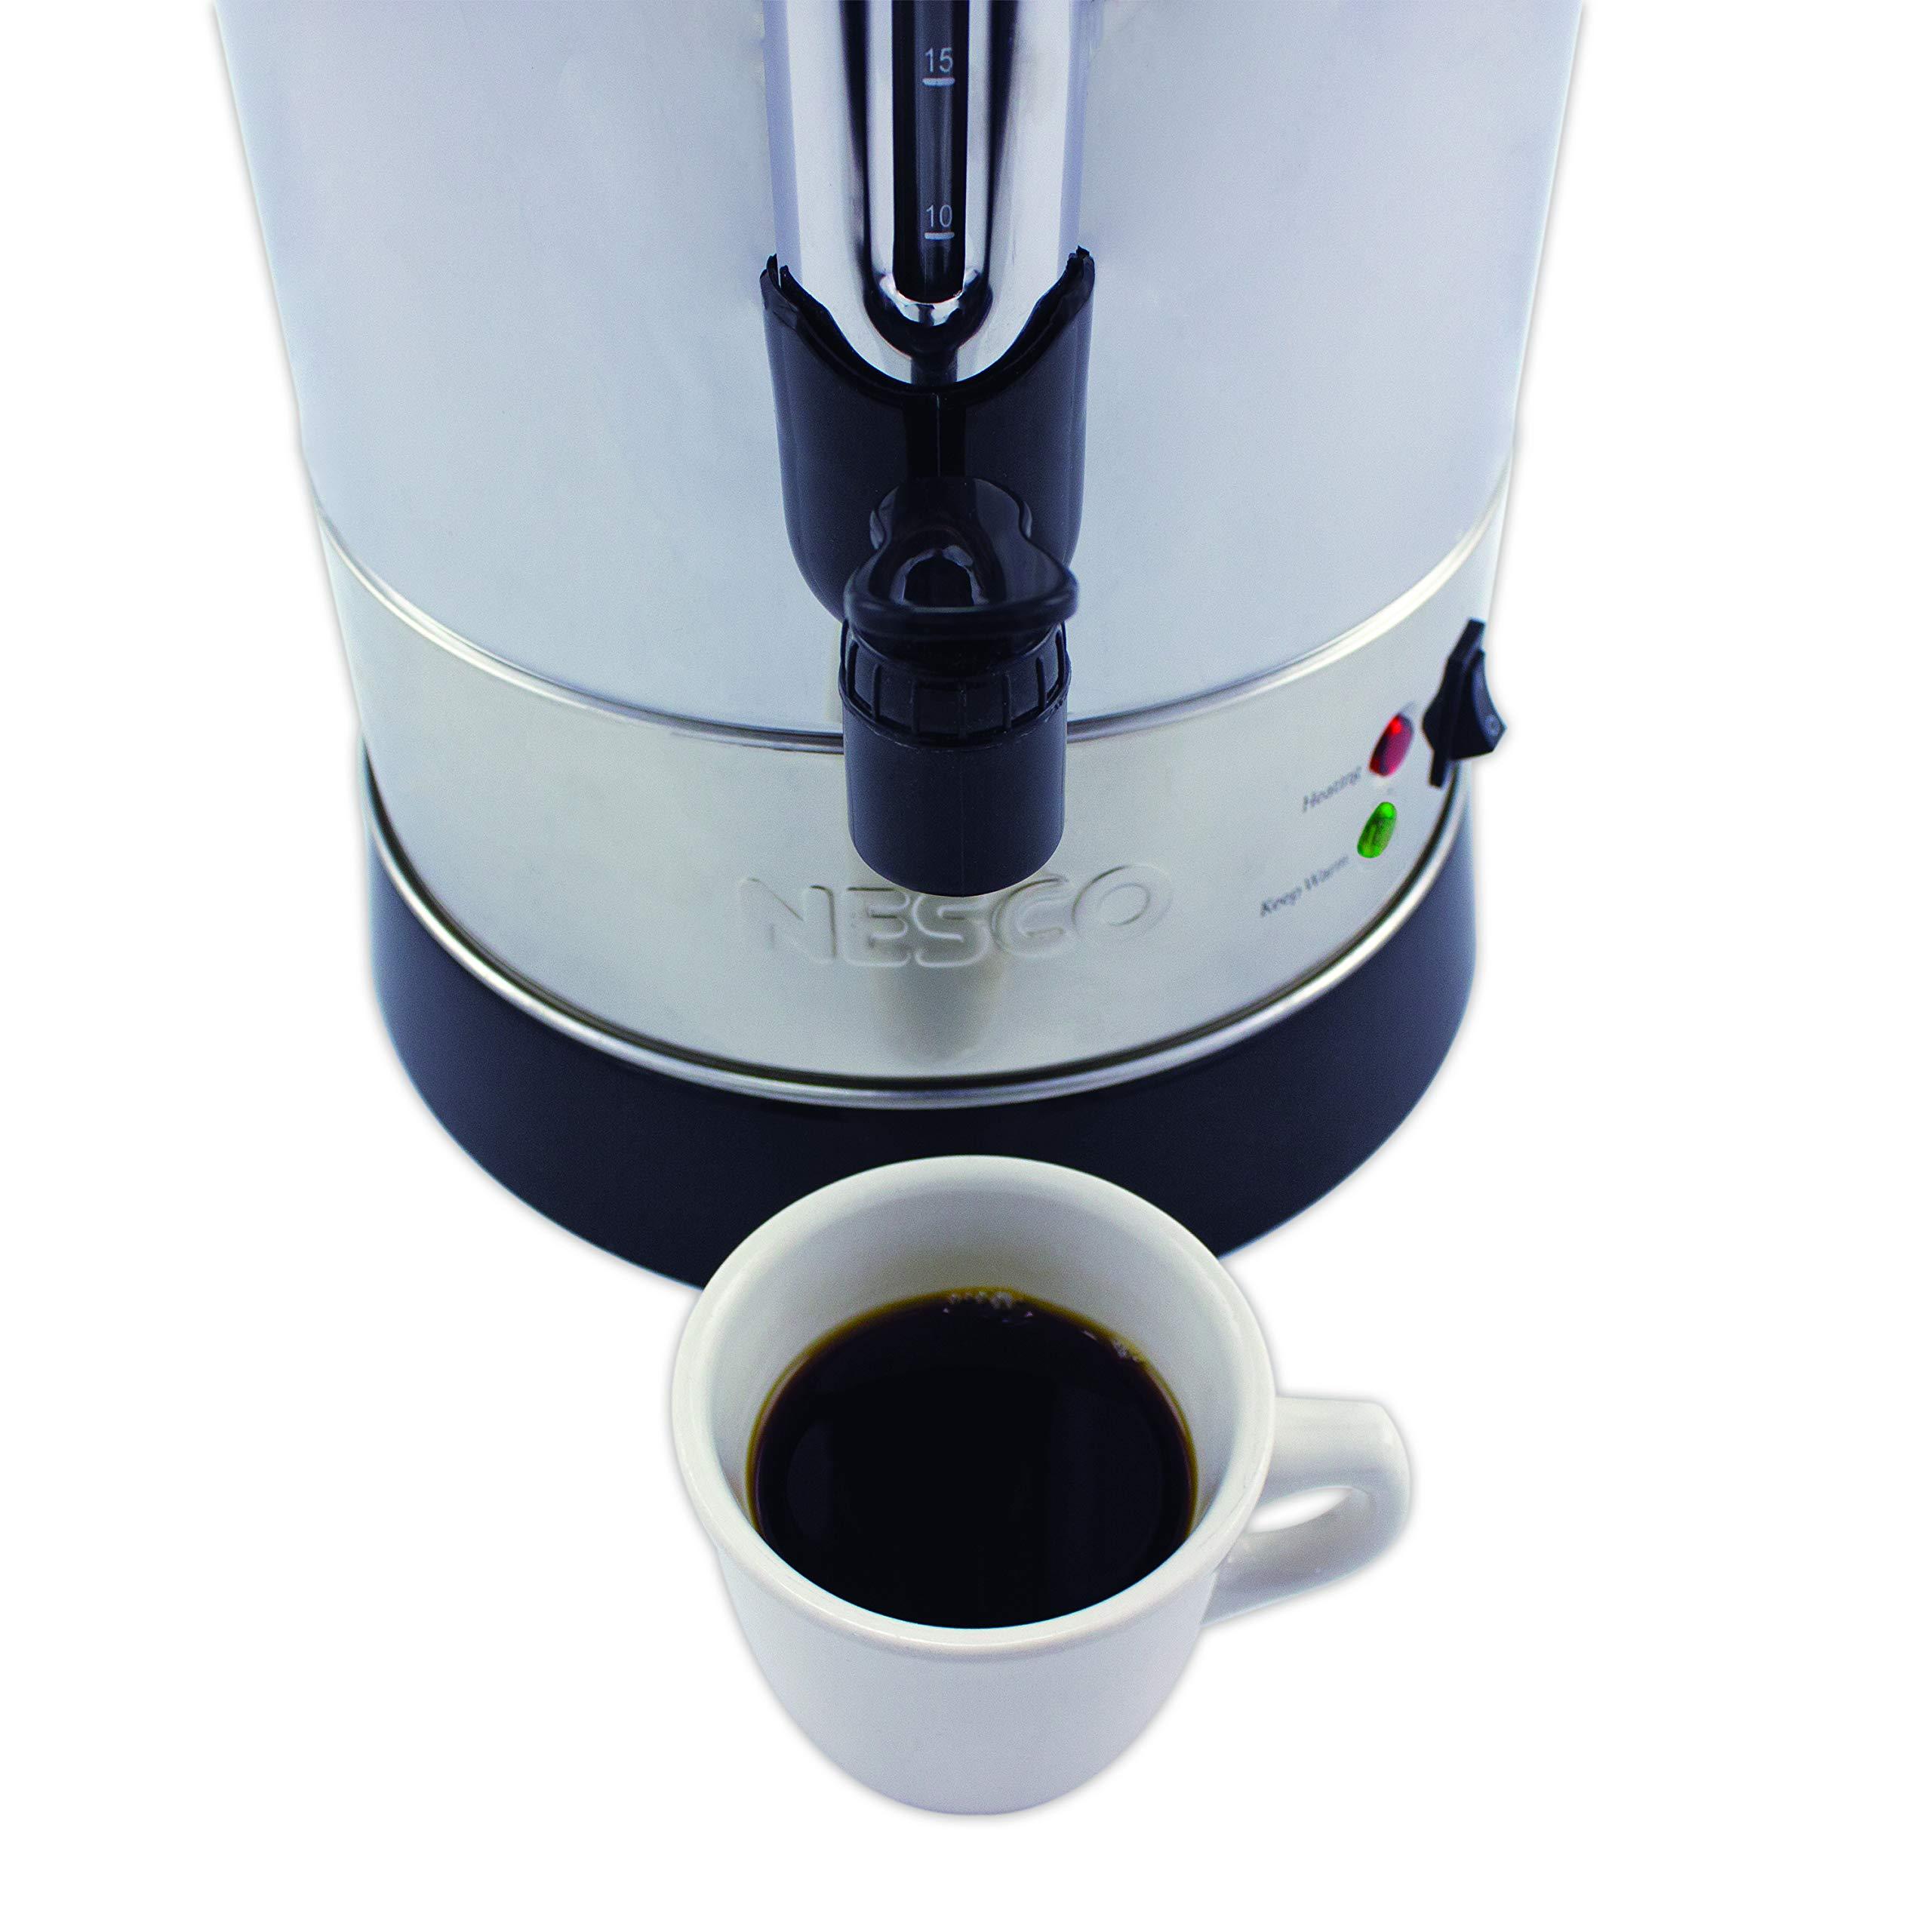 Nesco CU-30 Professional Coffee Urn Stainless Steel by Nesco (Image #6)